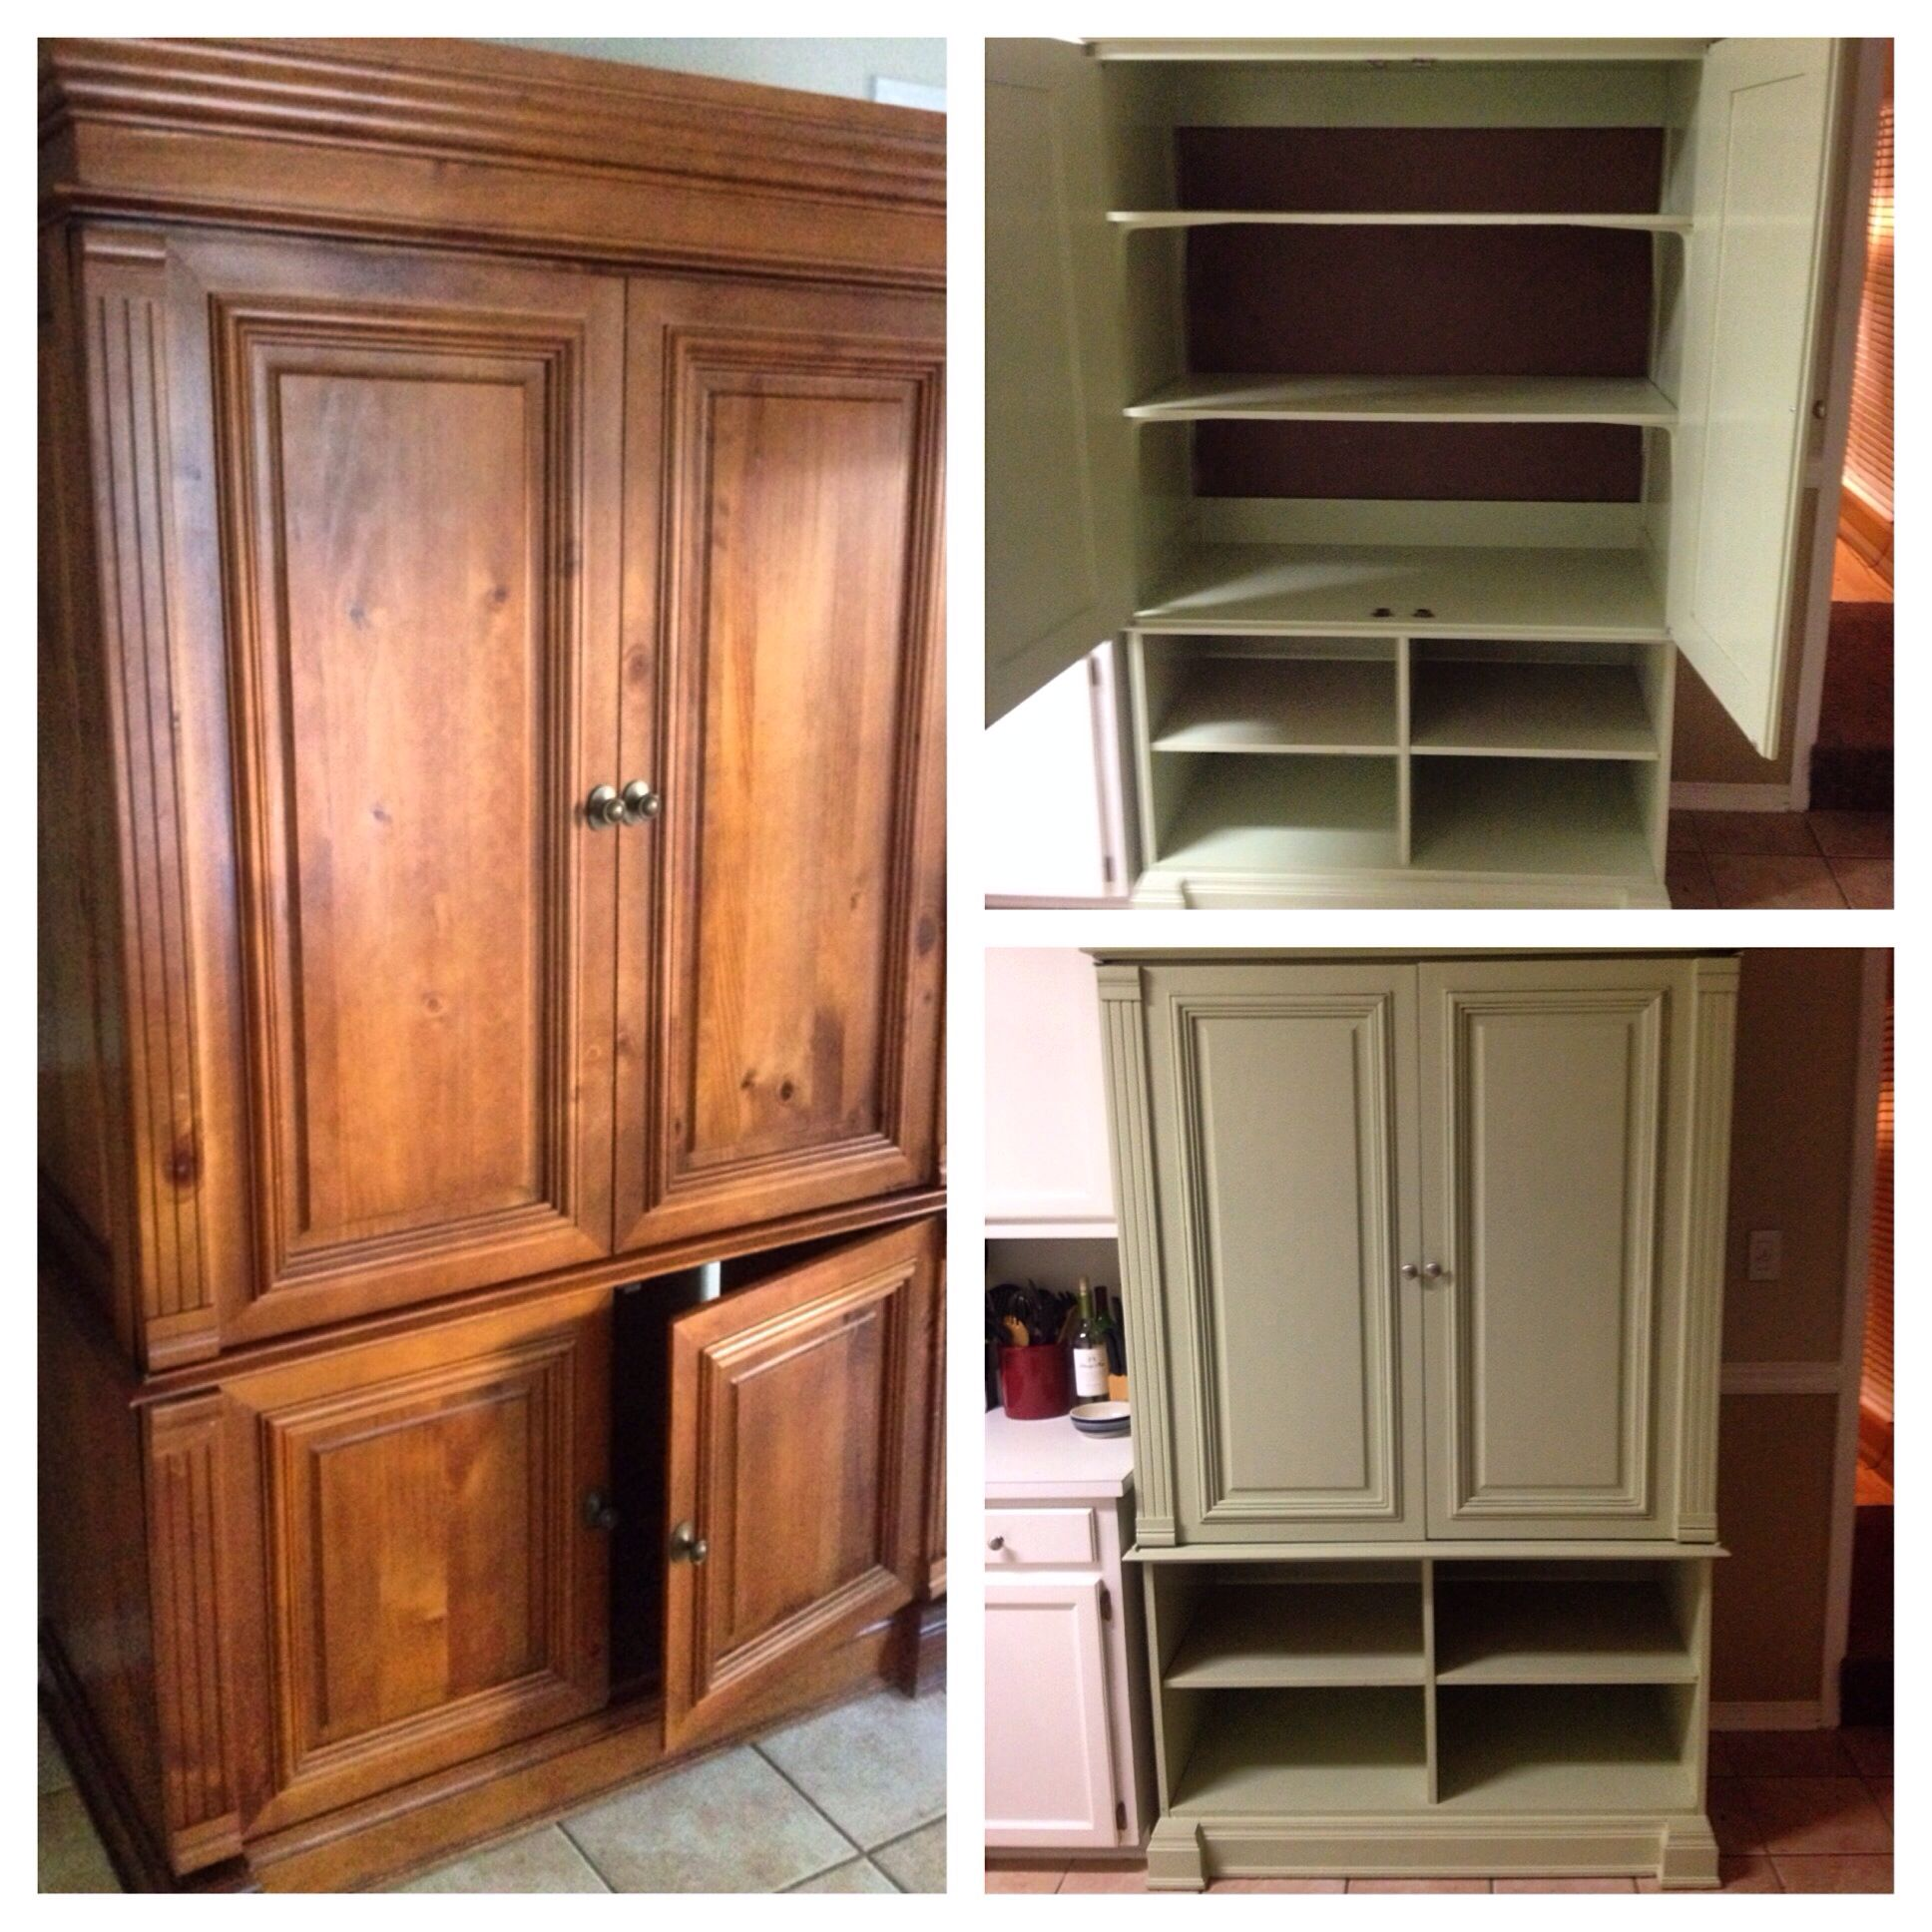 Turn an old tv armoir into a cute kitchen pantry diy diy pantry